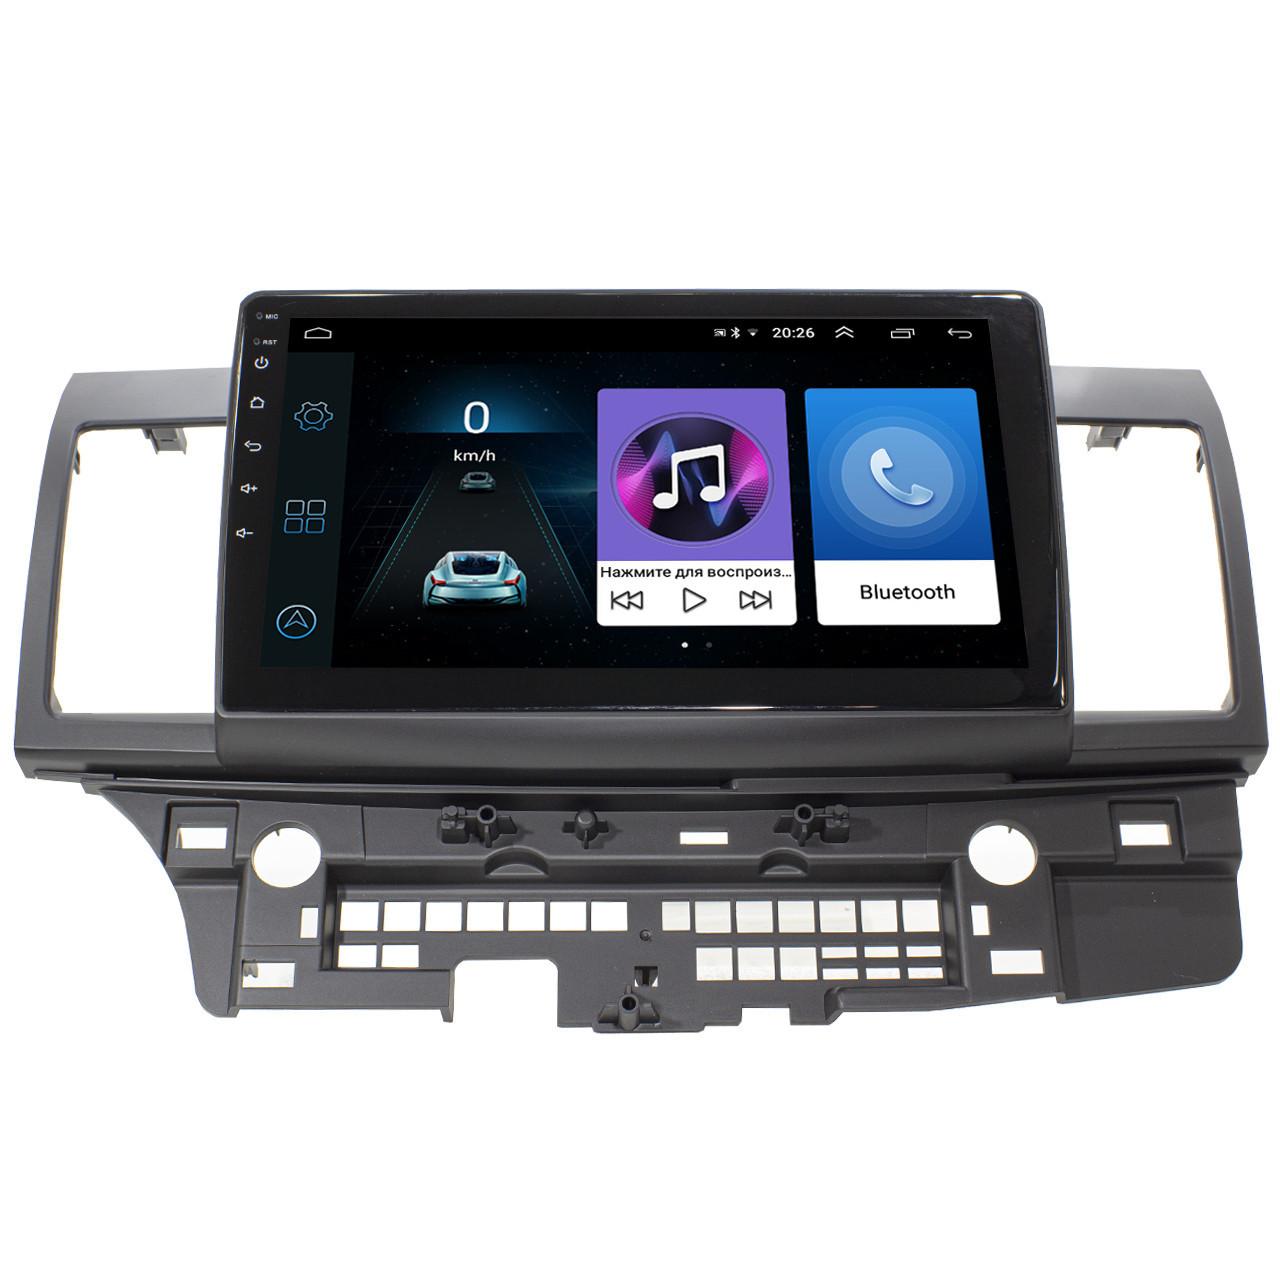 Штатная магнитола для авто Mitsubishi Lancer X (2007-2017) экран 10.1 4х50Вт 1/16GB 1080P GPS Wi Fi (3608-10478)